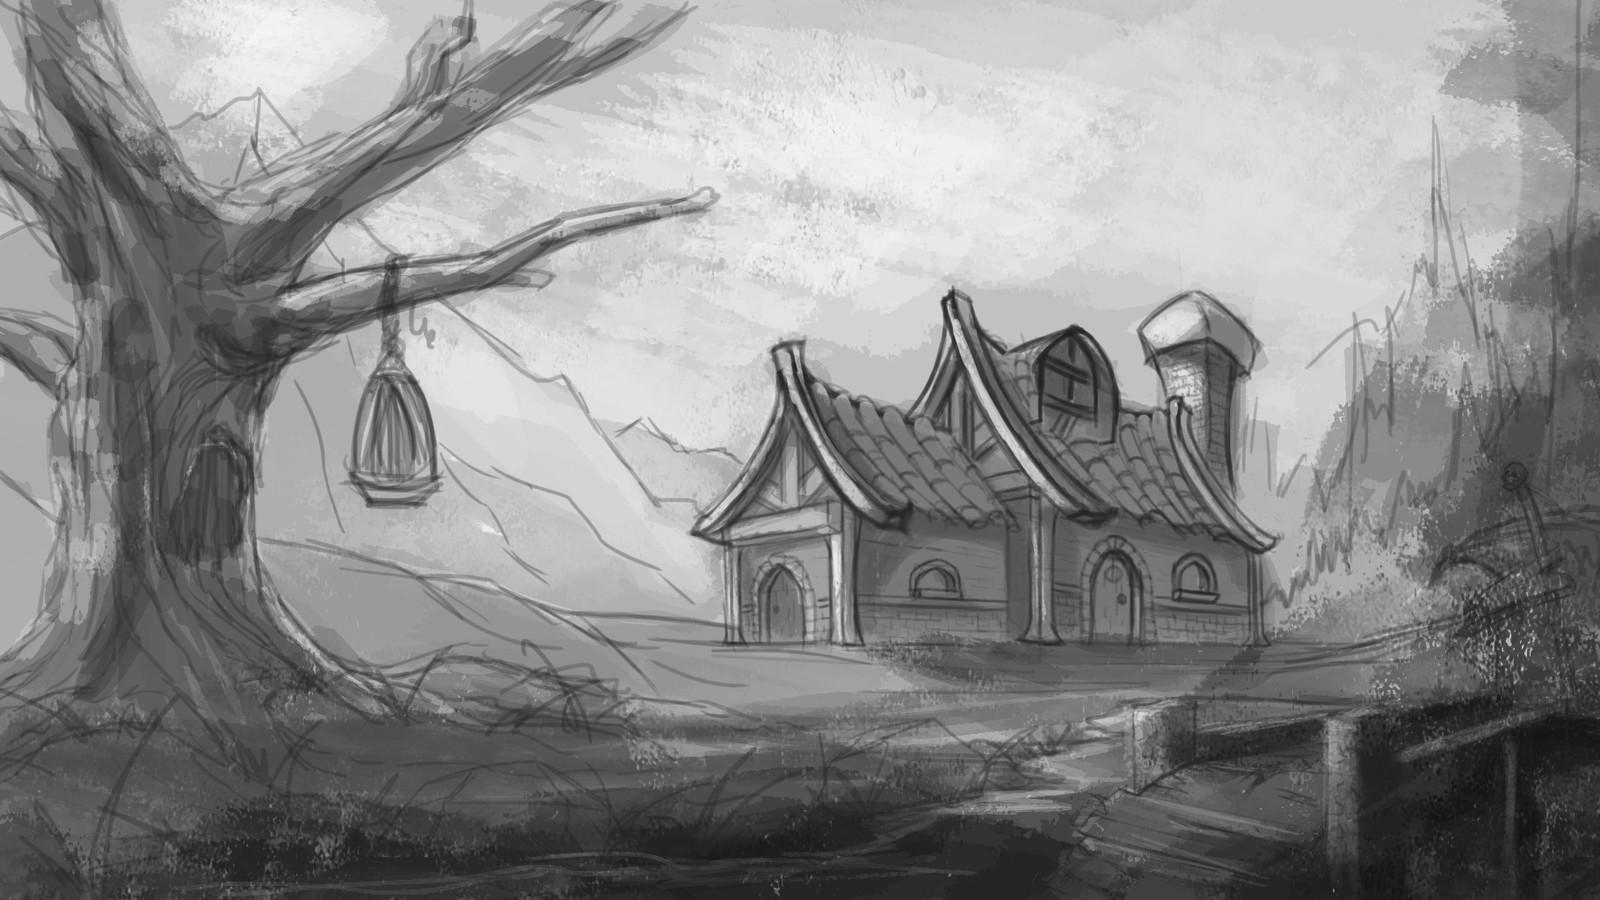 Rough greyscale sketch